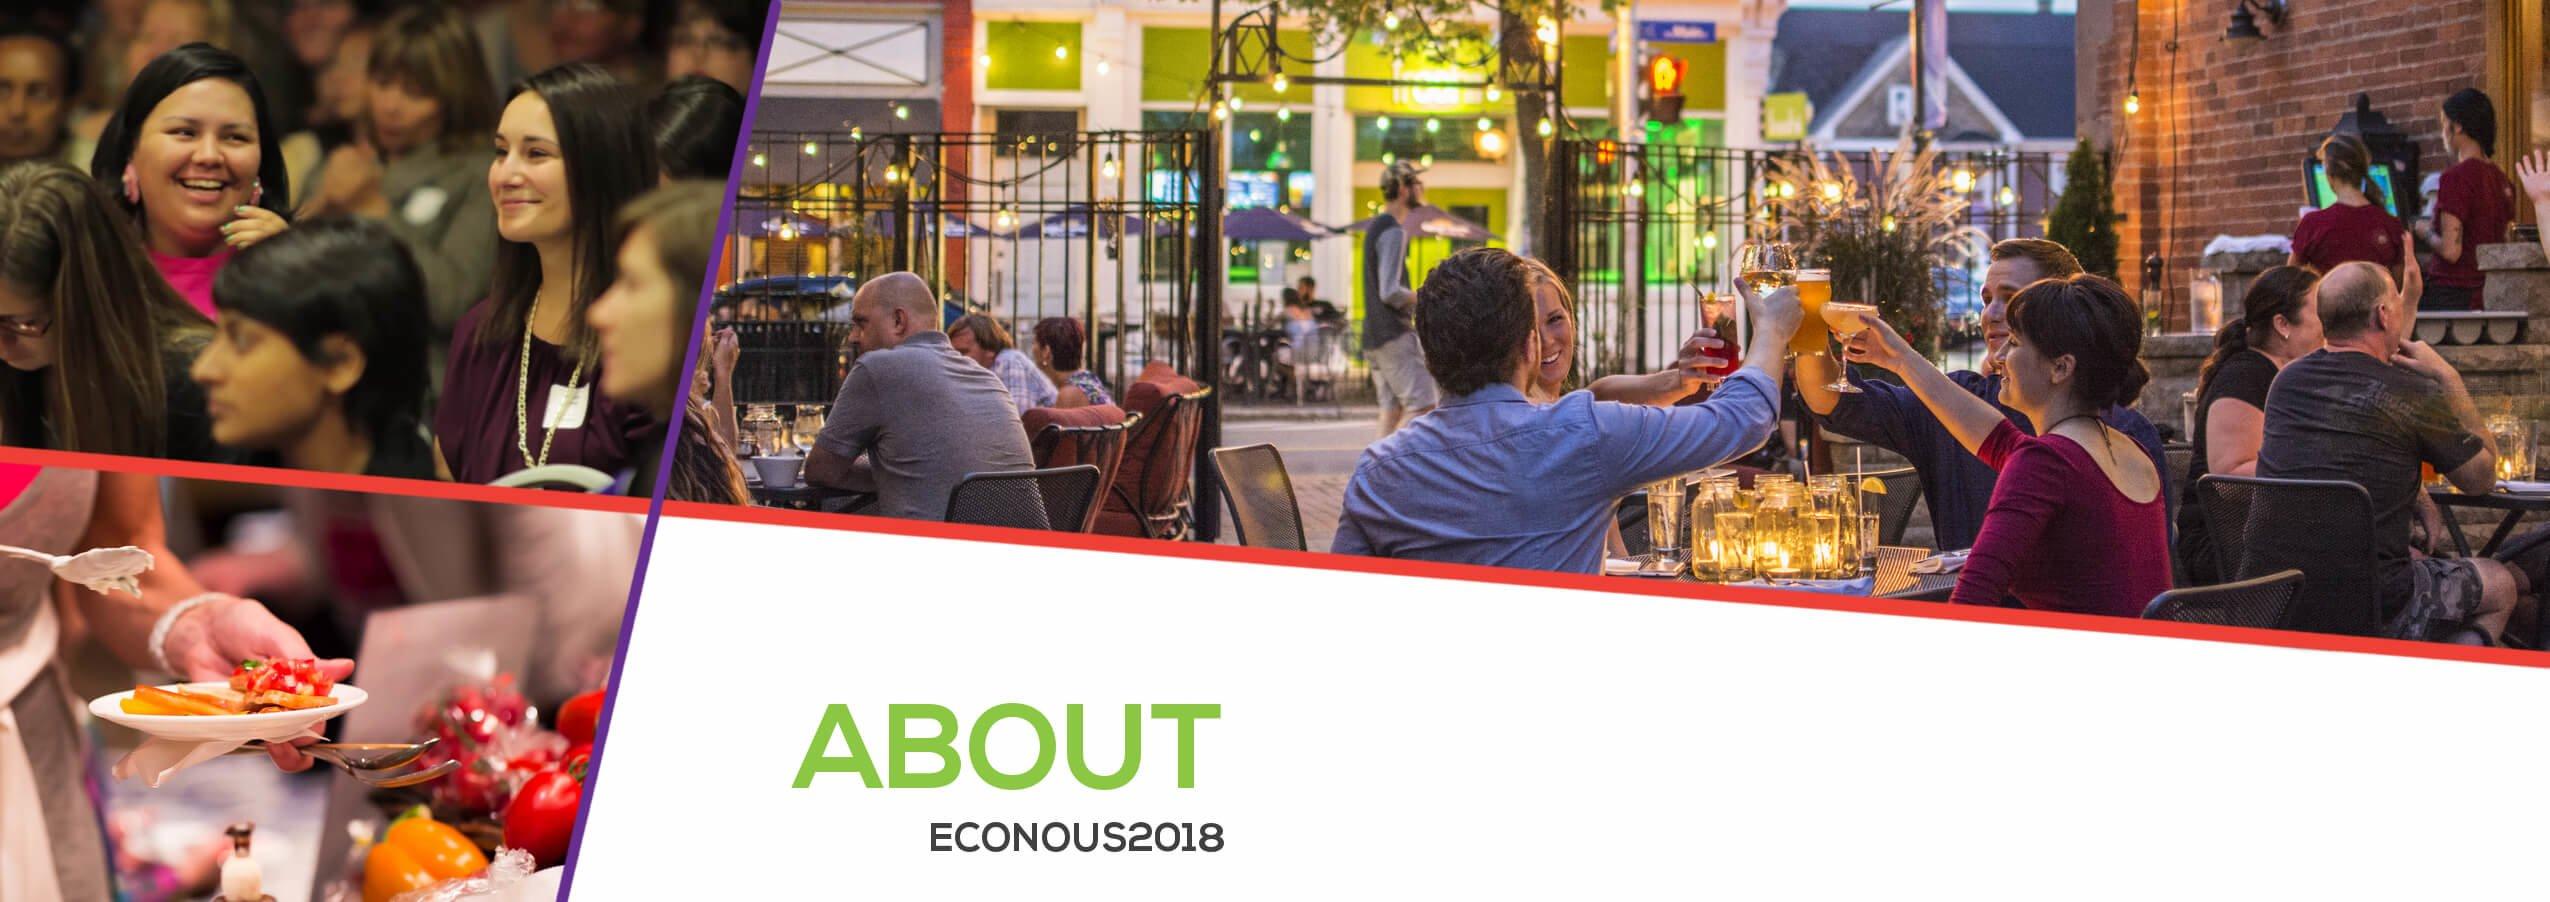 About EconoUs2017